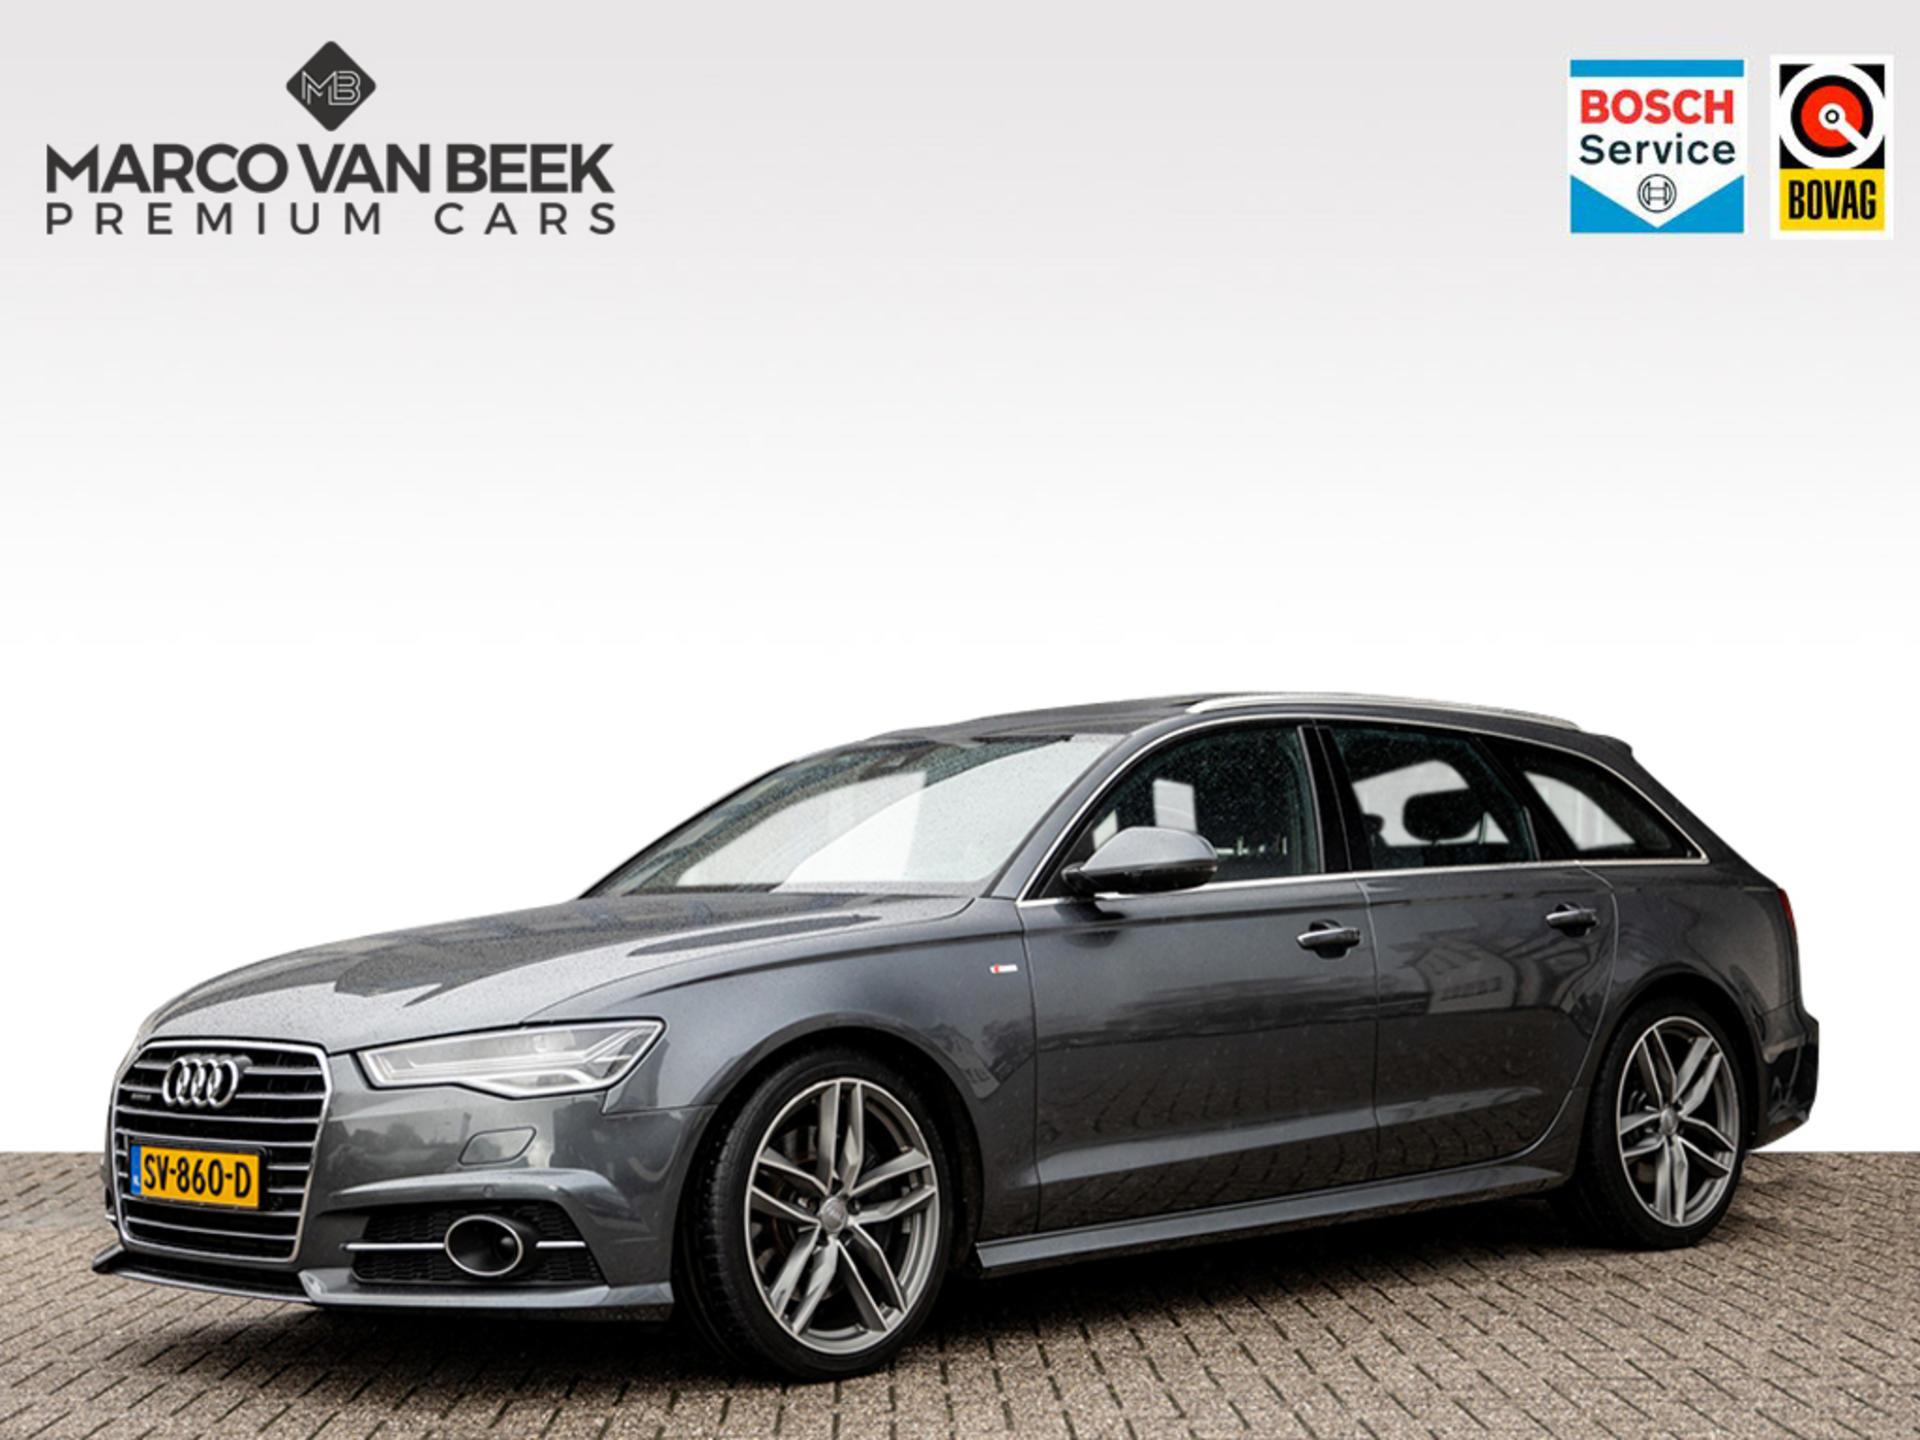 Audi A6 Avant 3.0 tdi bit quattro facelift pano leer verkocht